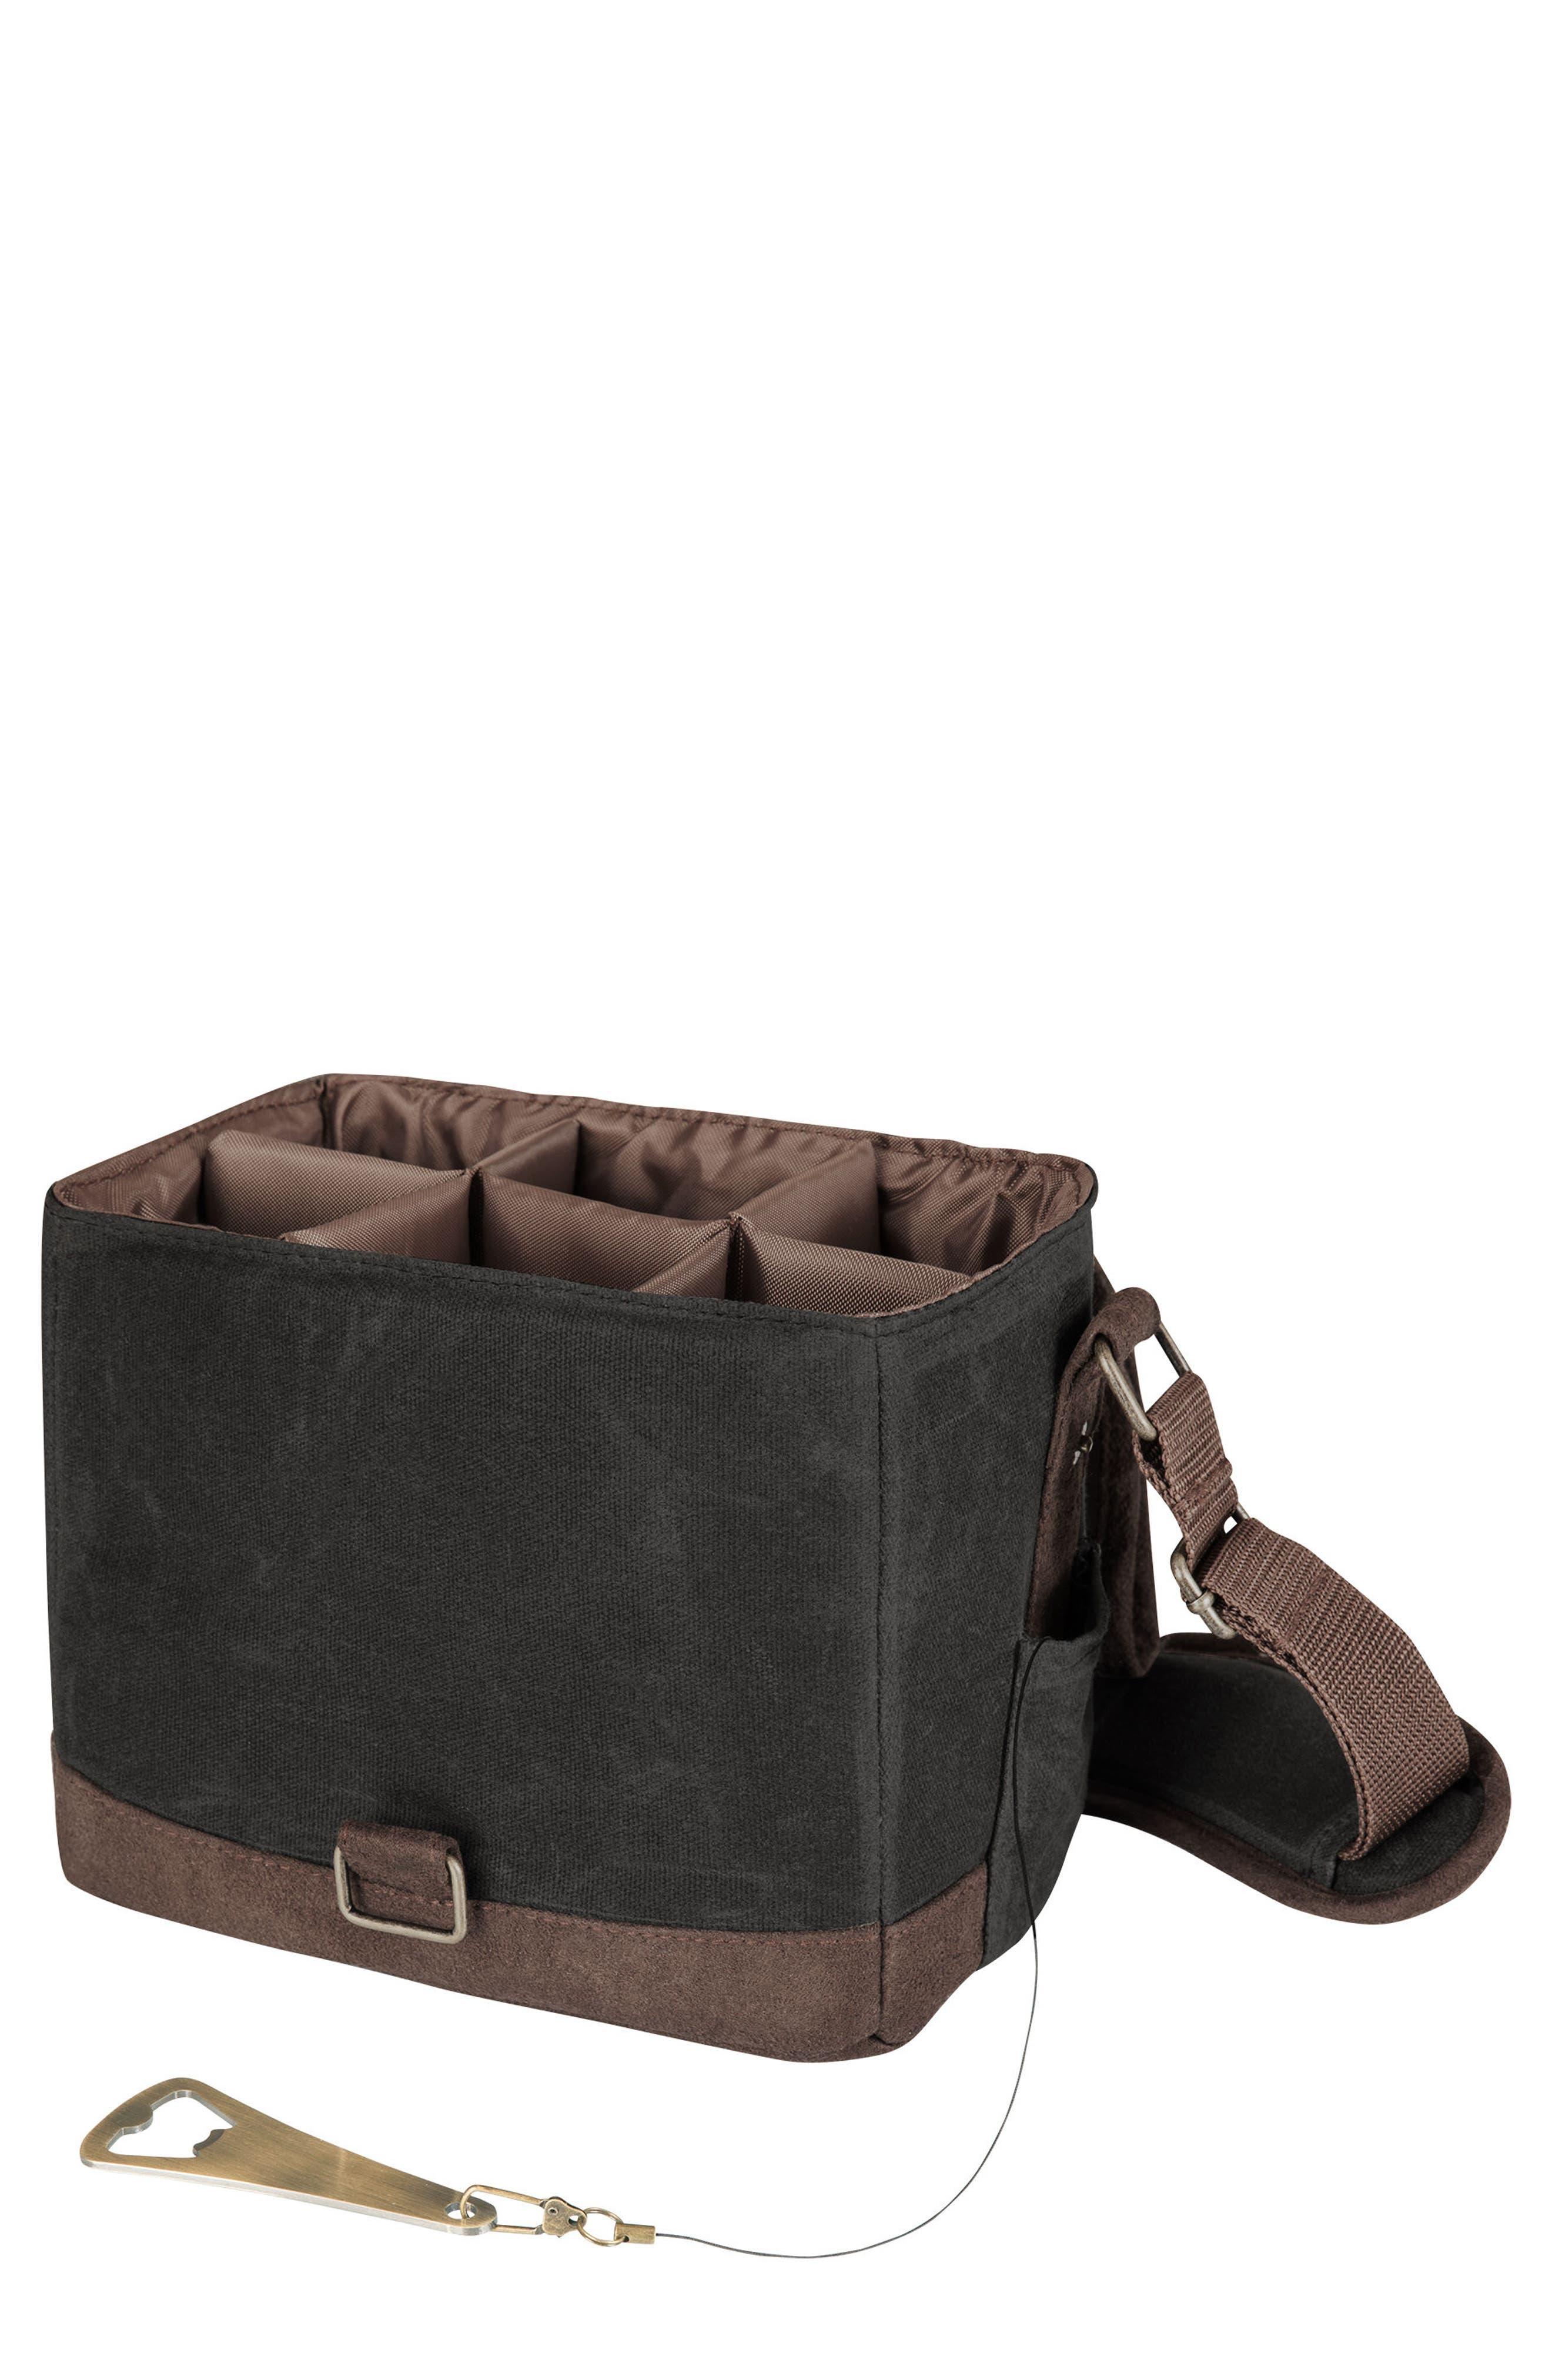 Beer Caddy Cooler Tote,                         Main,                         color, Black/ Brown